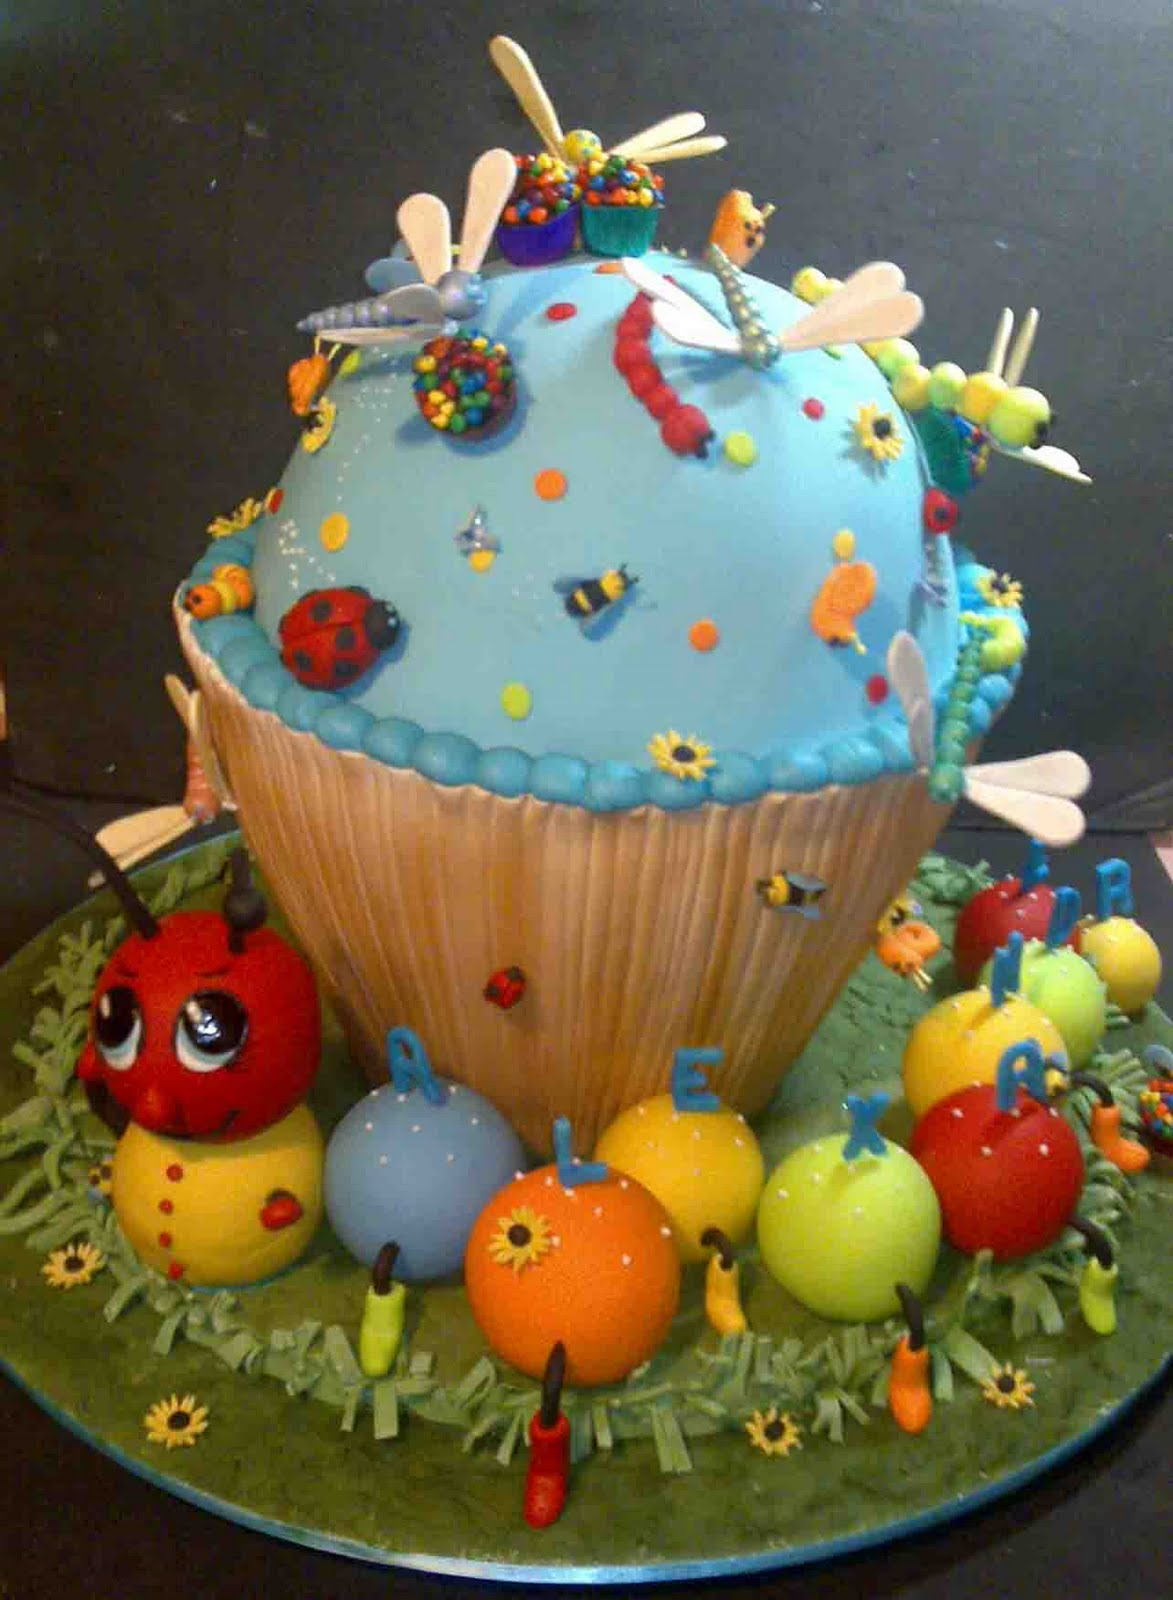 Crumbs Cake Art Facebook : Welcome to CrumbsCakeArt.blogspot.com: Wonderful Cake ...